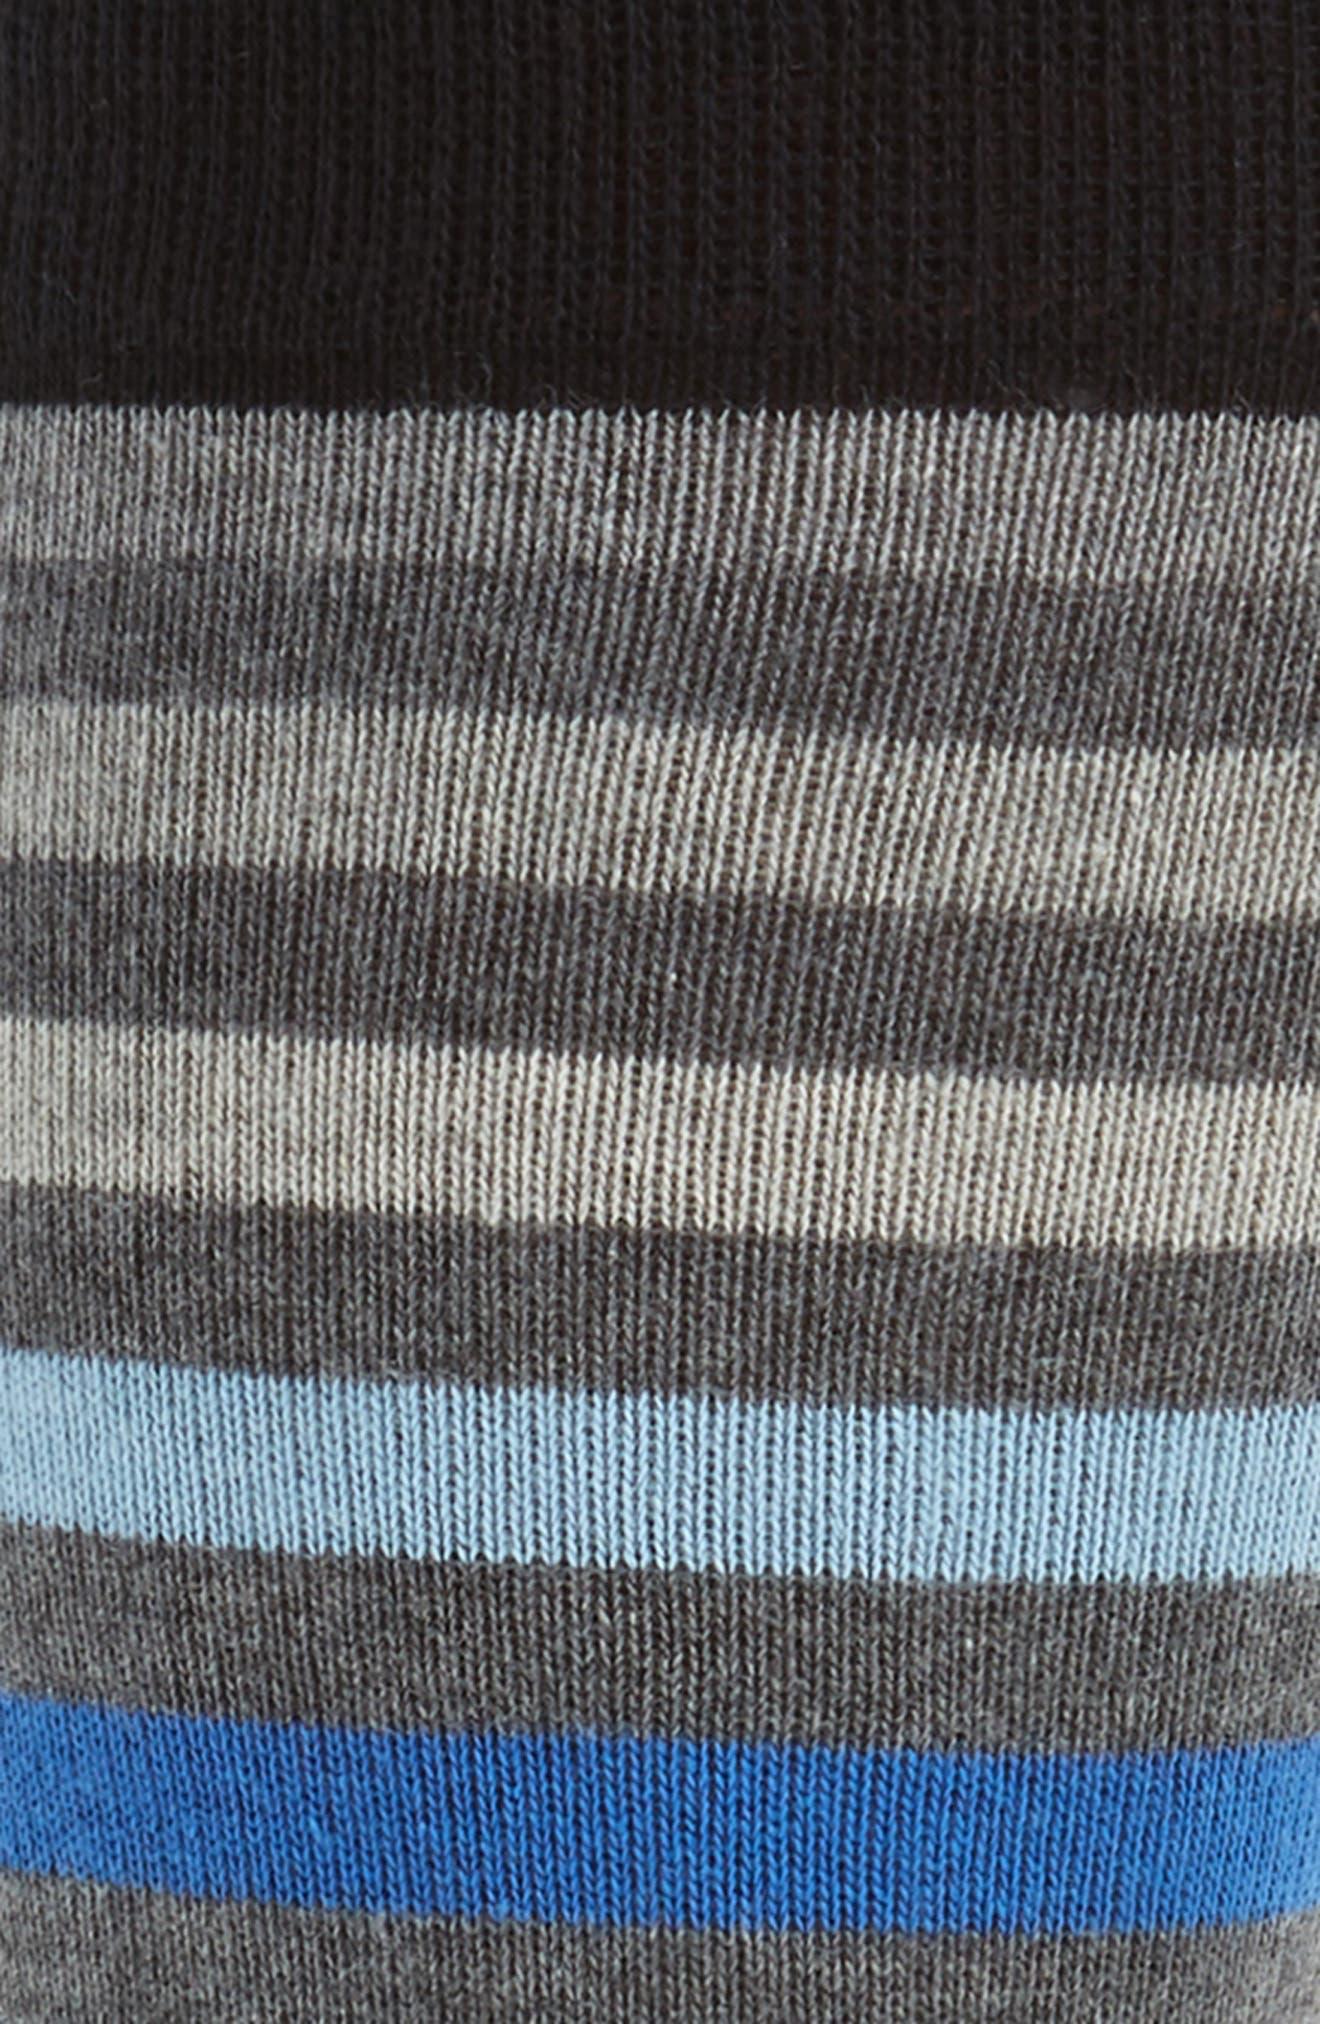 Heather Stripe Socks,                             Alternate thumbnail 2, color,                             001